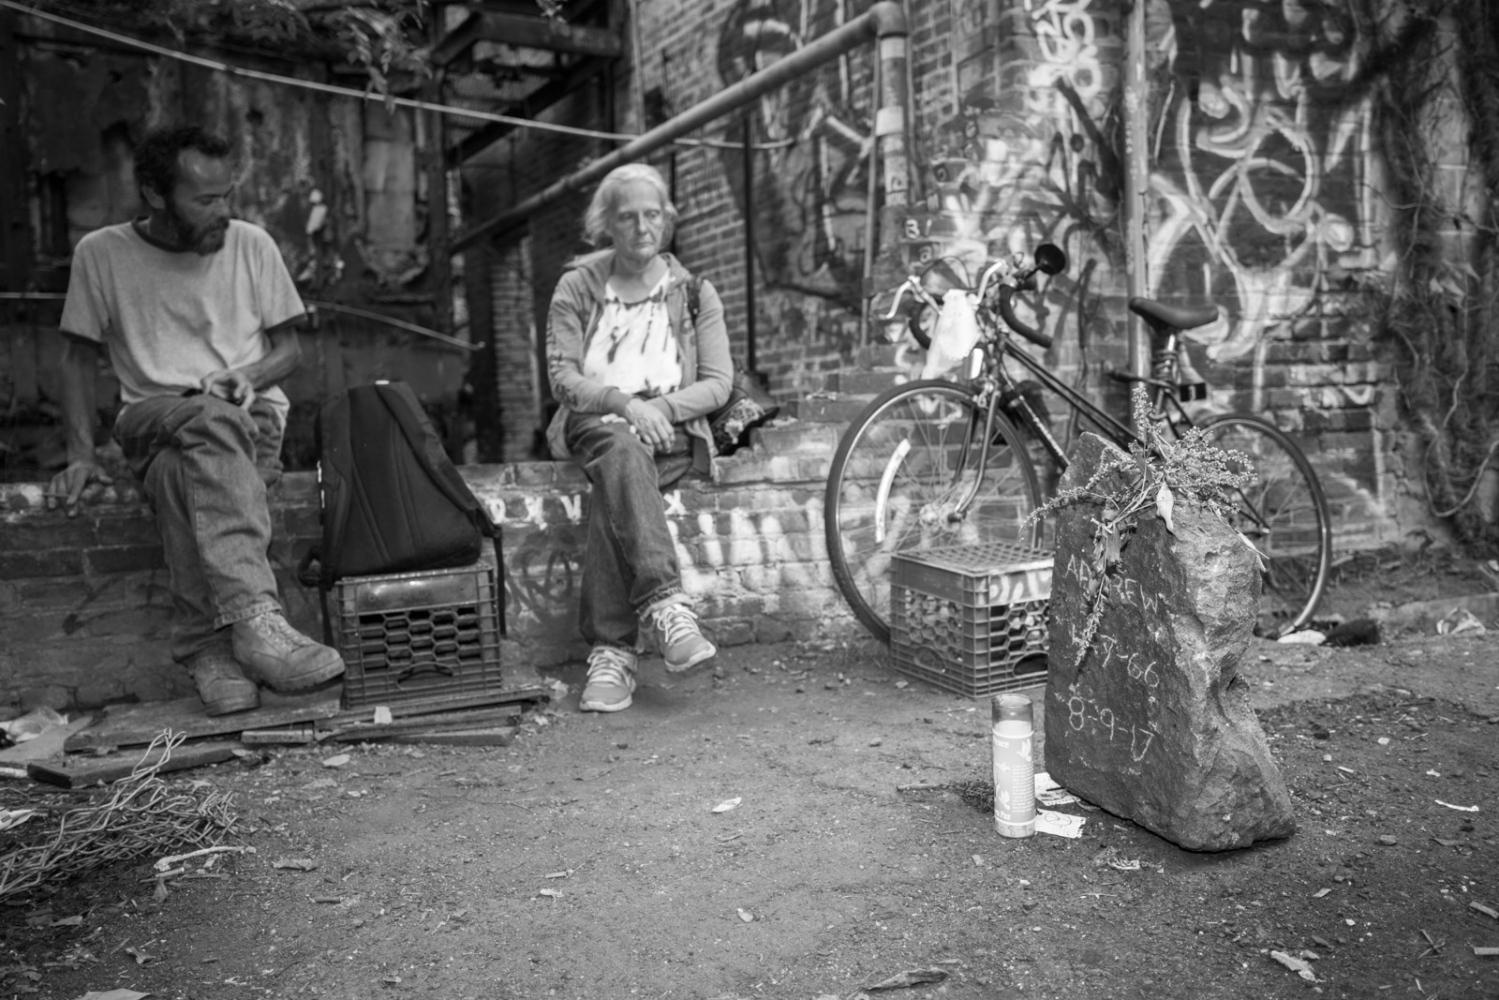 Art and Documentary Photography - Loading 17_HomeoftheBrave.jpg